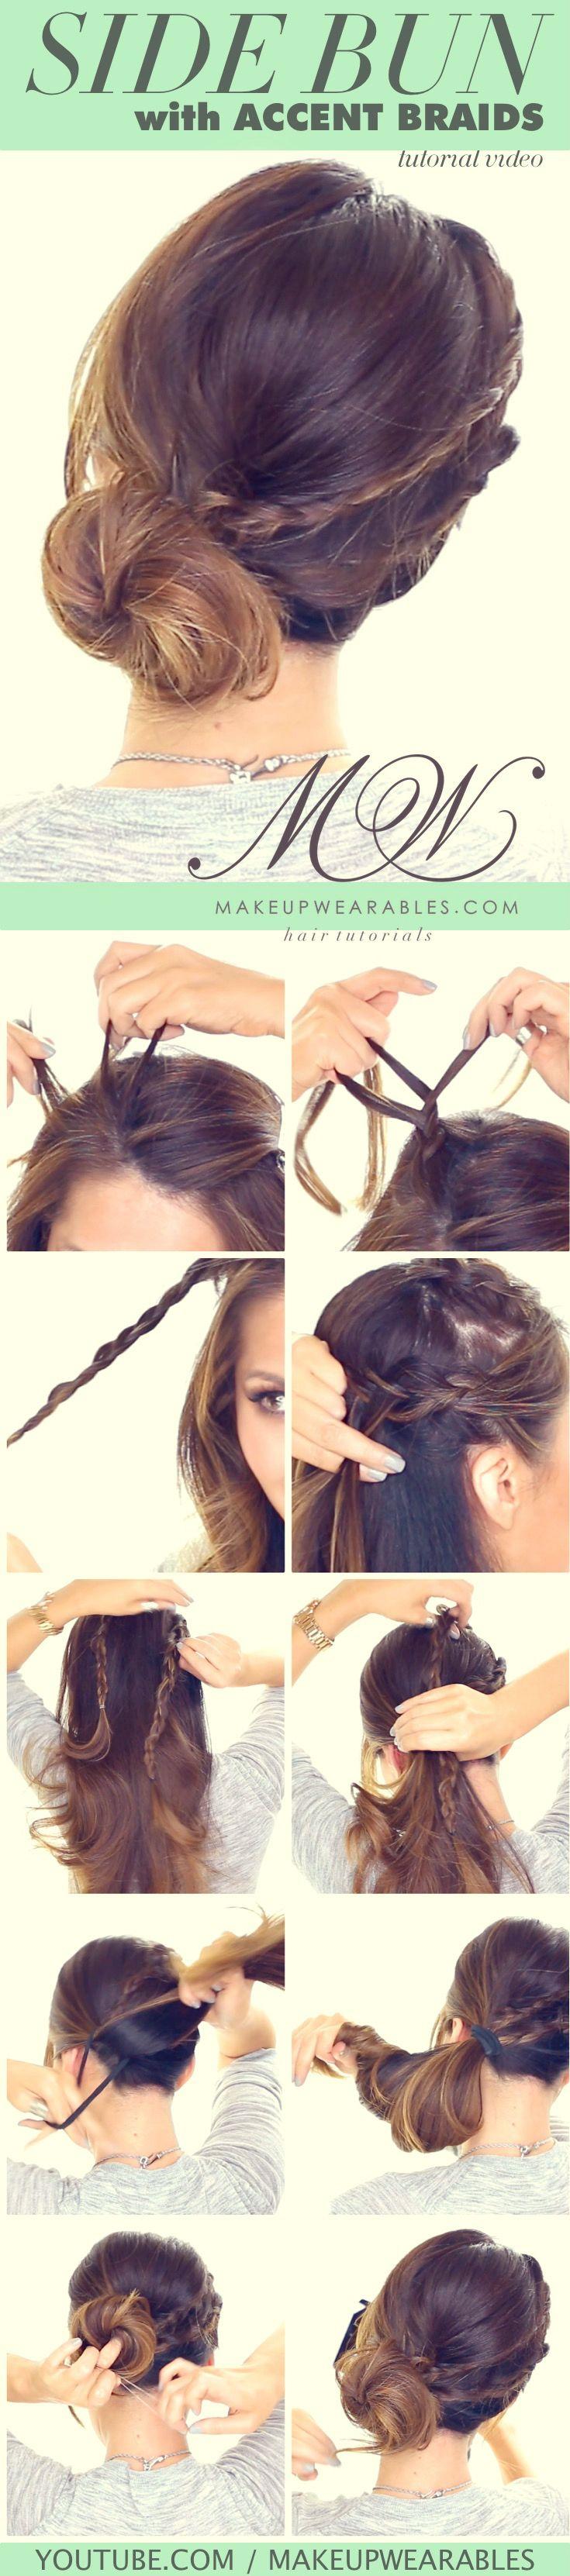 Easy Side Braid Messy Bun  - cute hairstyles for everyday